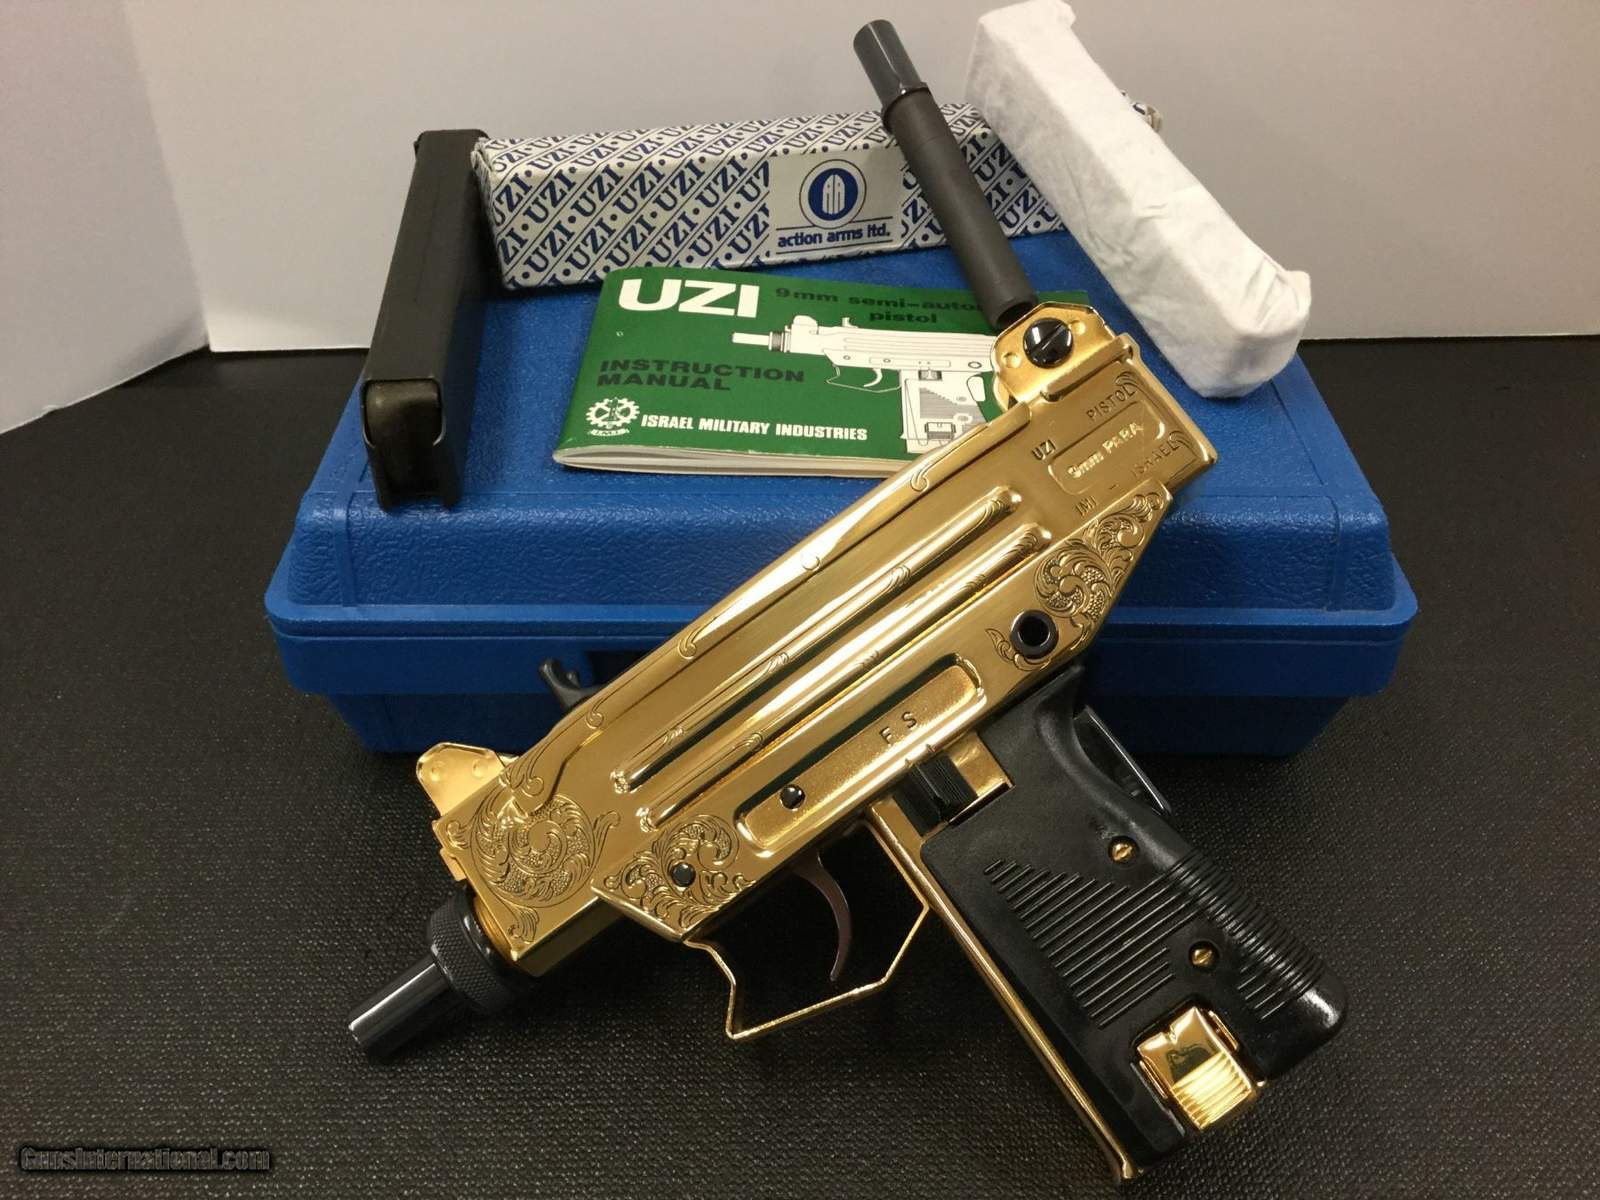 https://s3.amazonaws.com/uploads.bmxmuseum.com/user-images/37048/imi-uzi-pistol-limited-edition-84-100-gold-plated_101265298_52388_629bb758967b6b1e5fbeedba8a.jpg